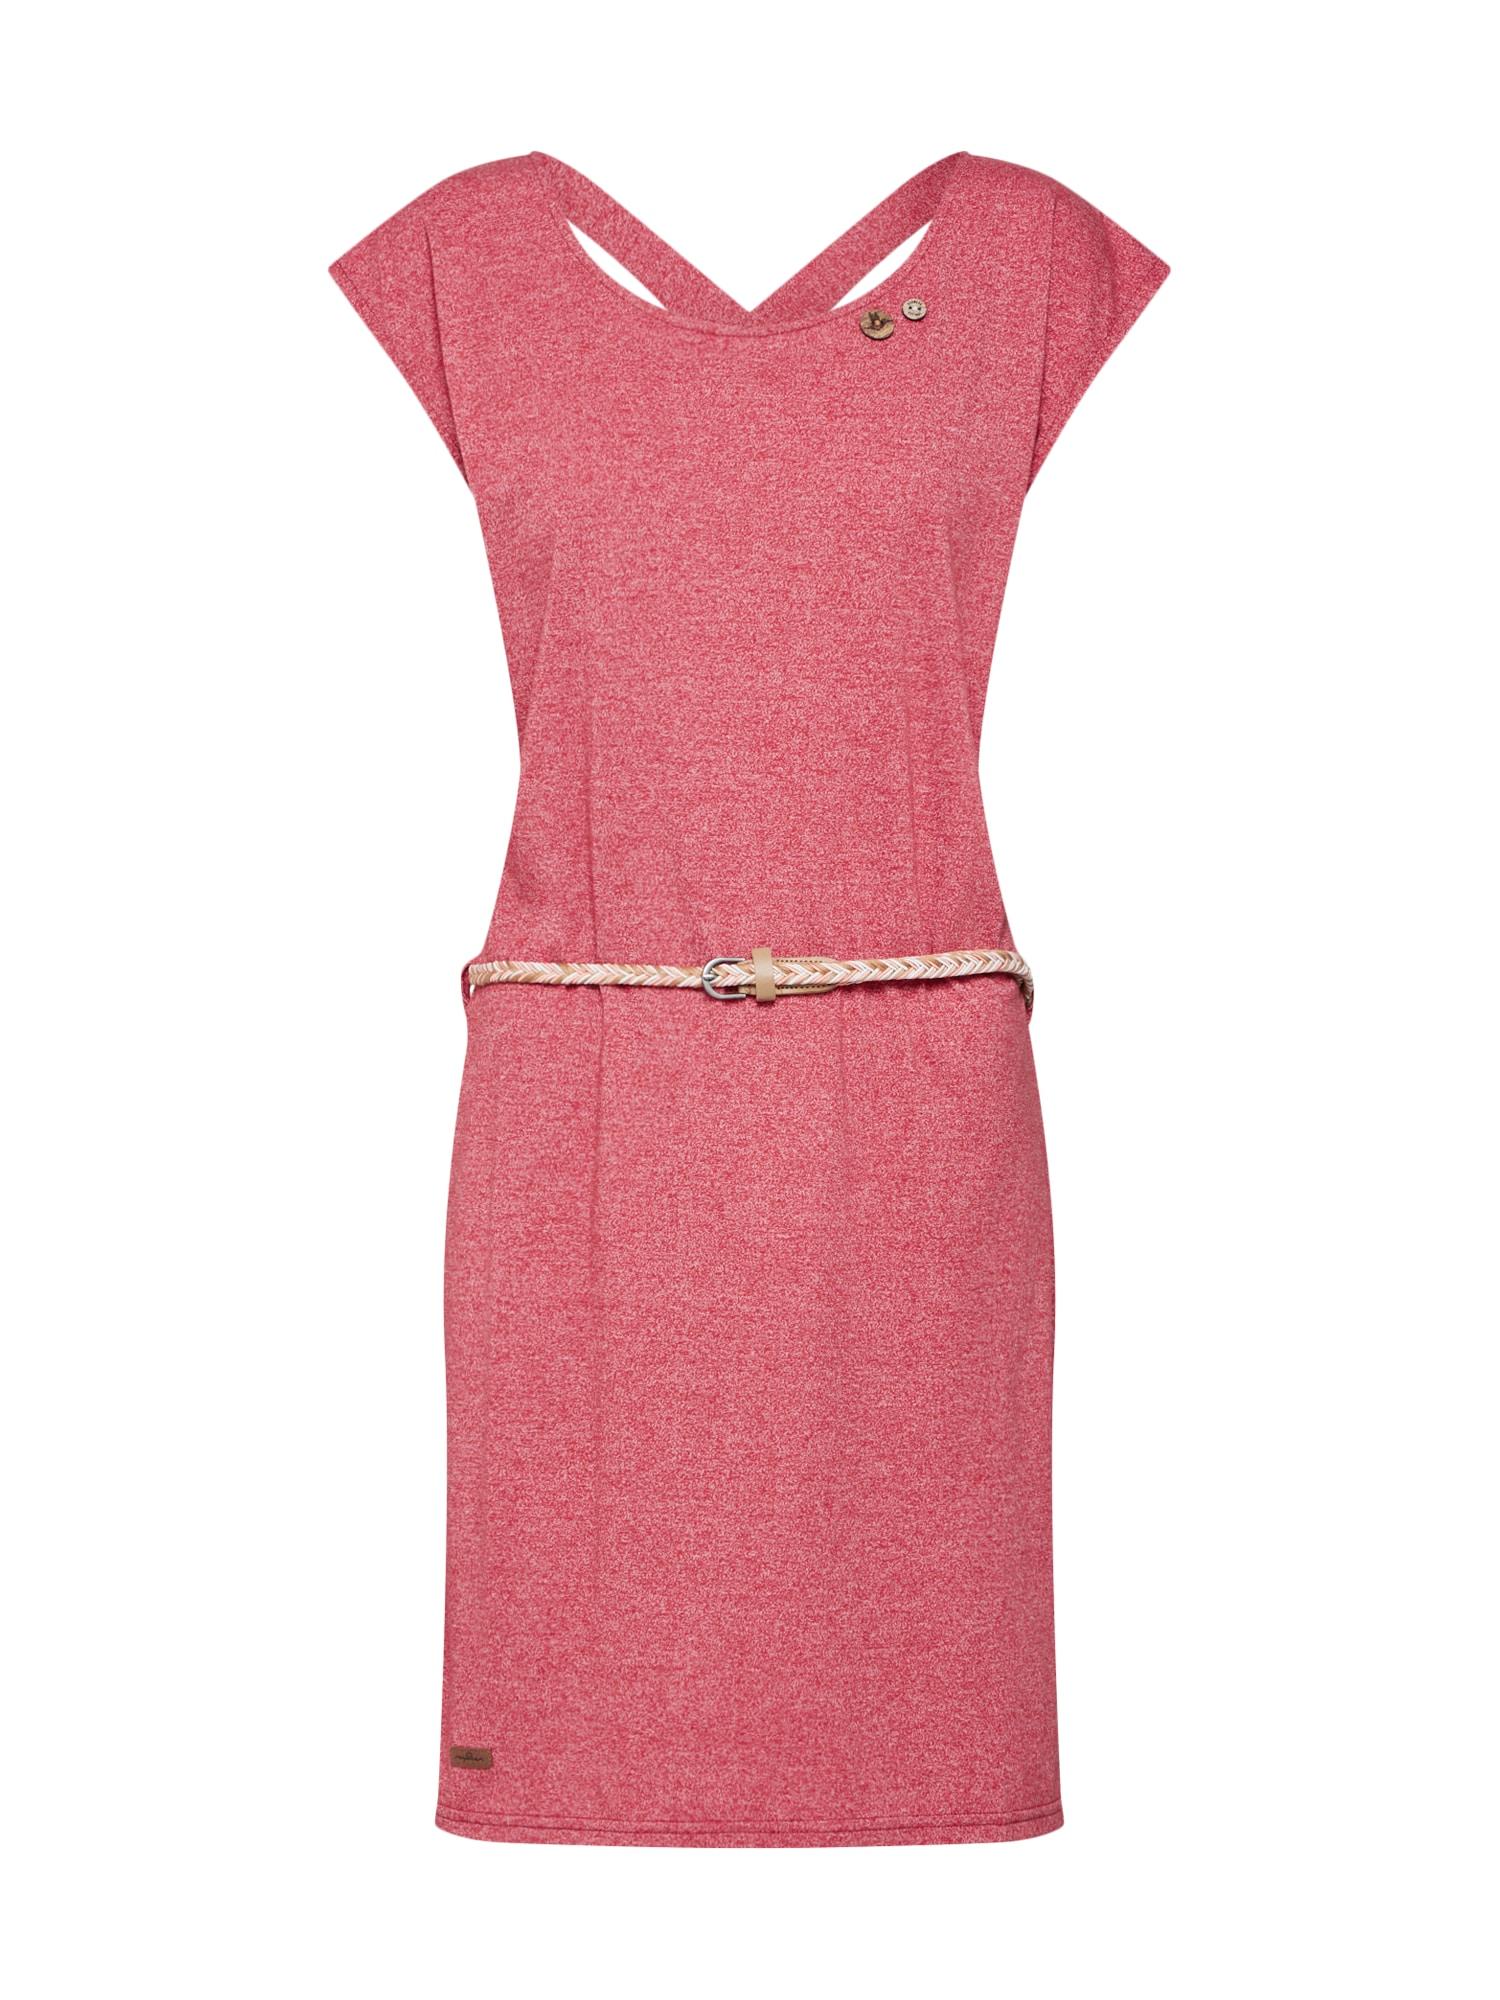 Letní šaty Sofia červená Ragwear